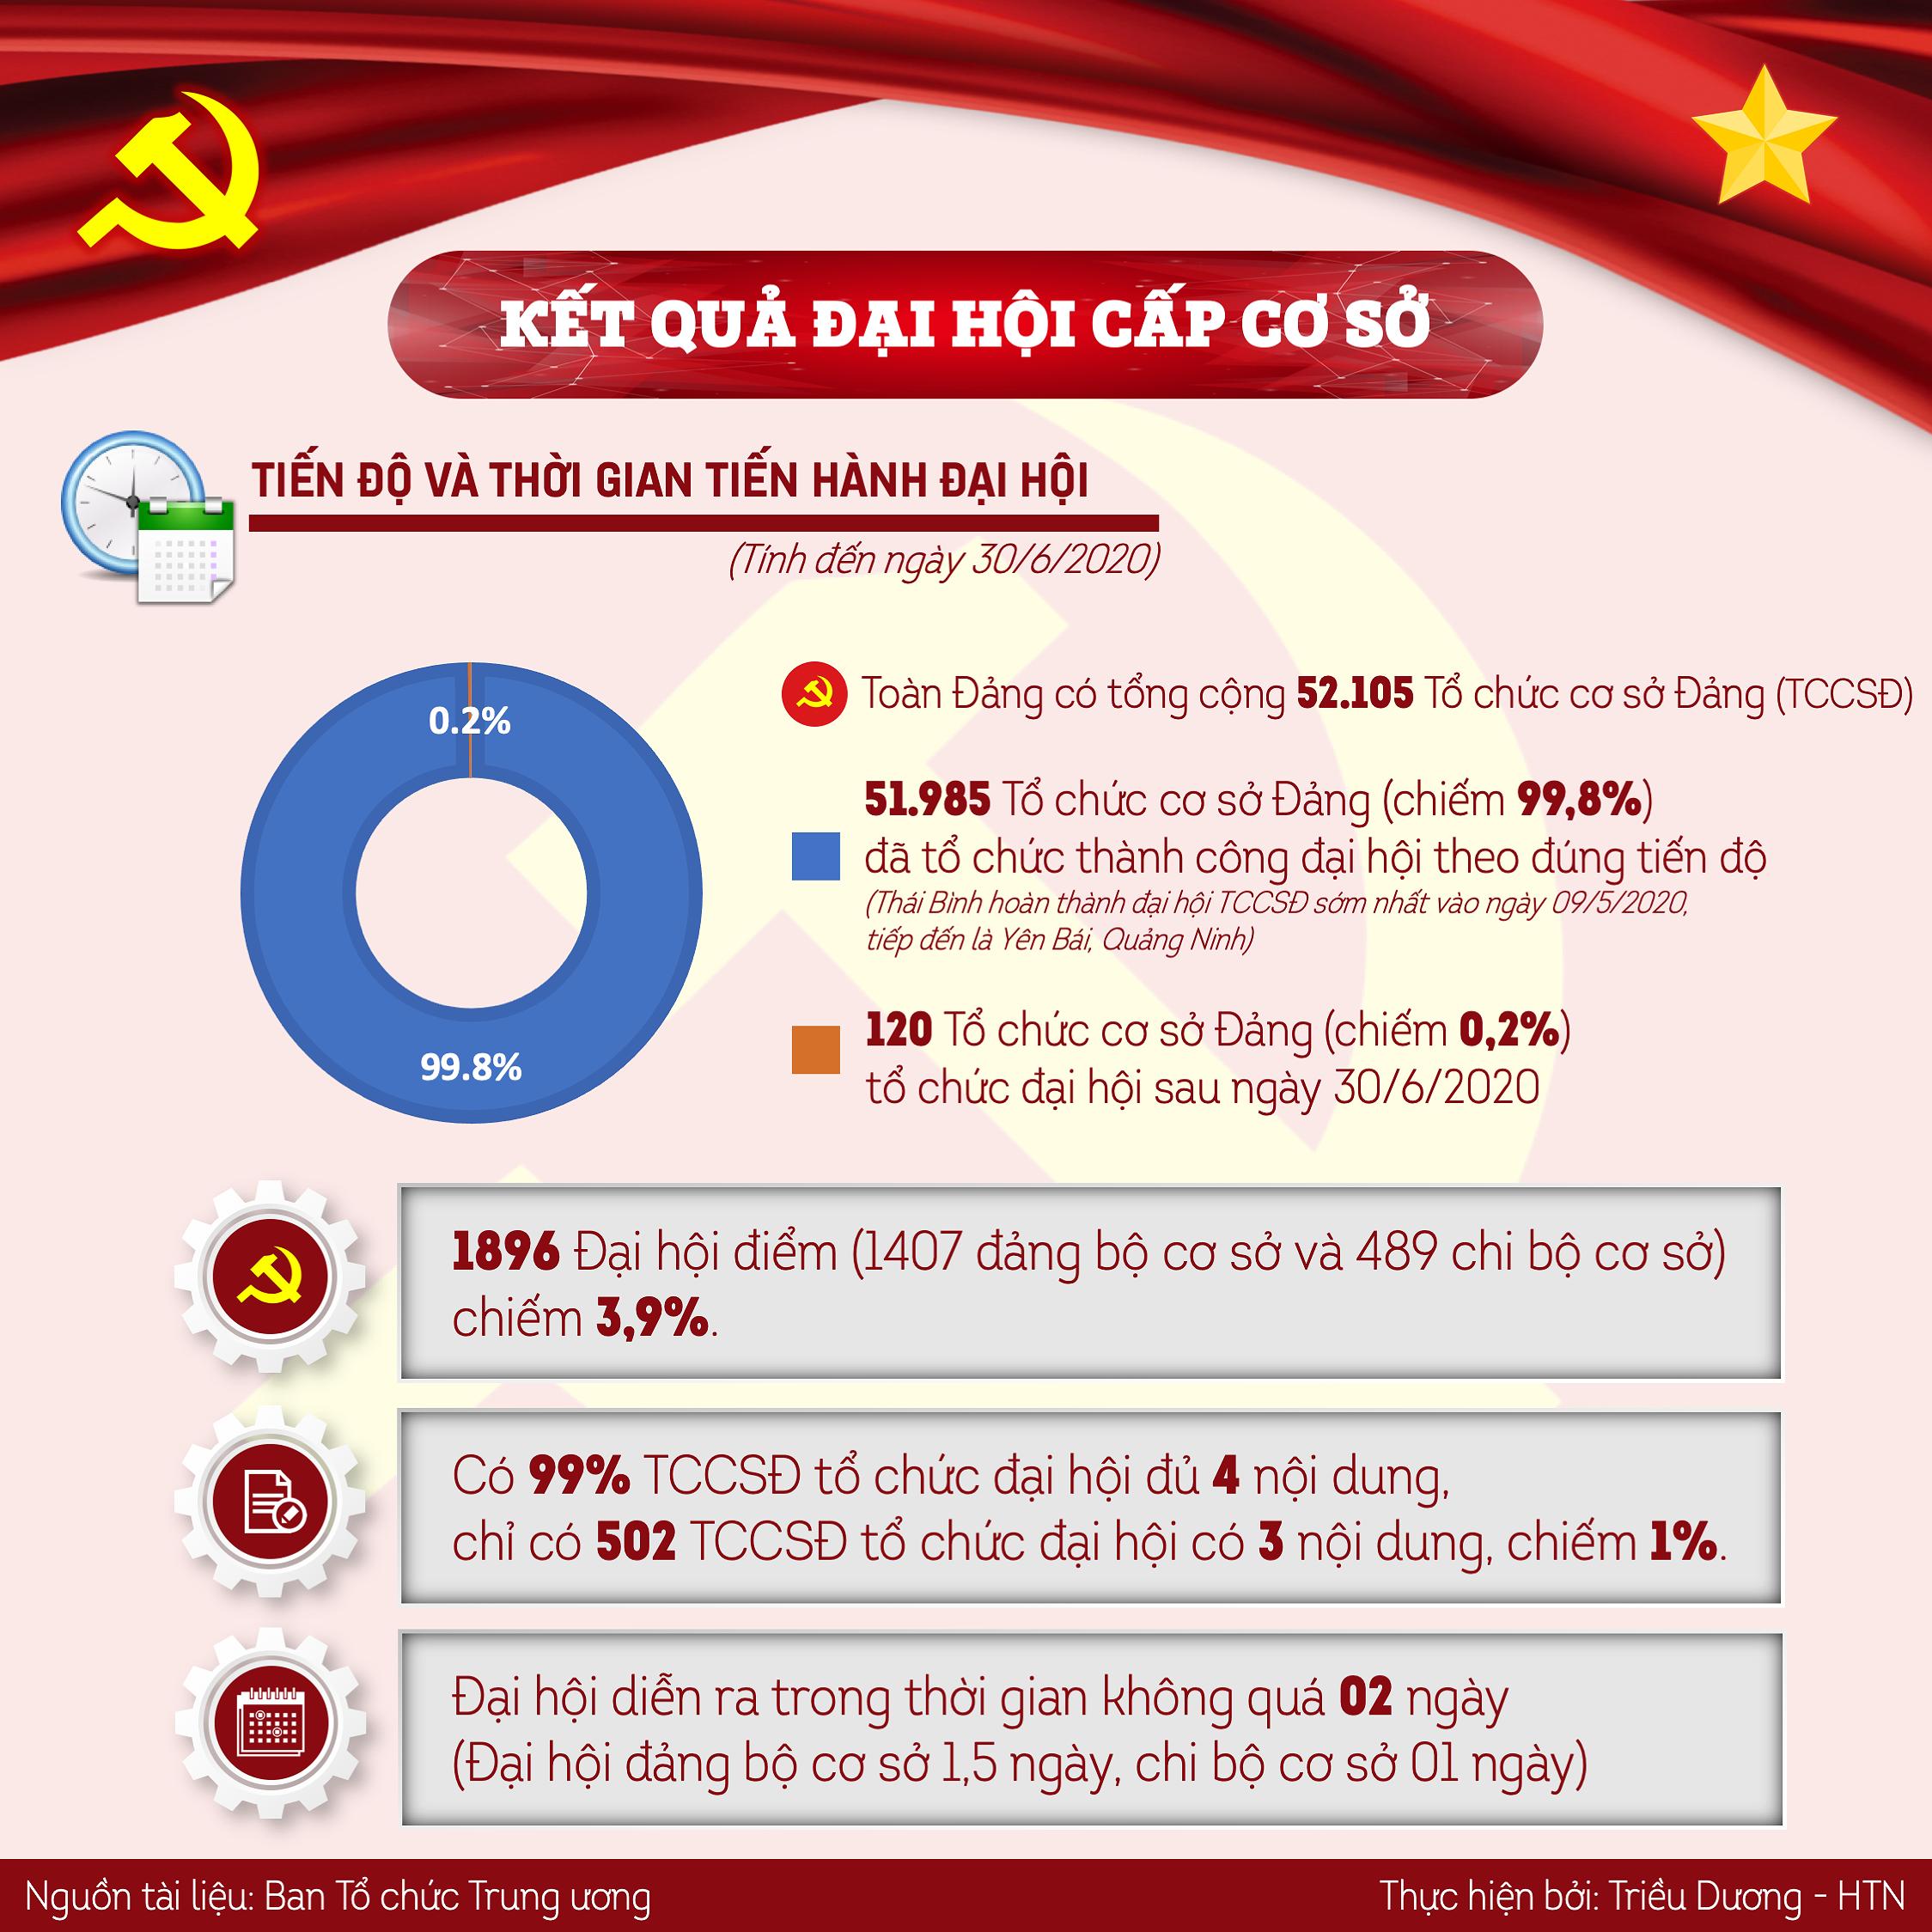 [Infographics] Mot so ket qua noi bat dai hoi to chuc co so dang hinh anh 1